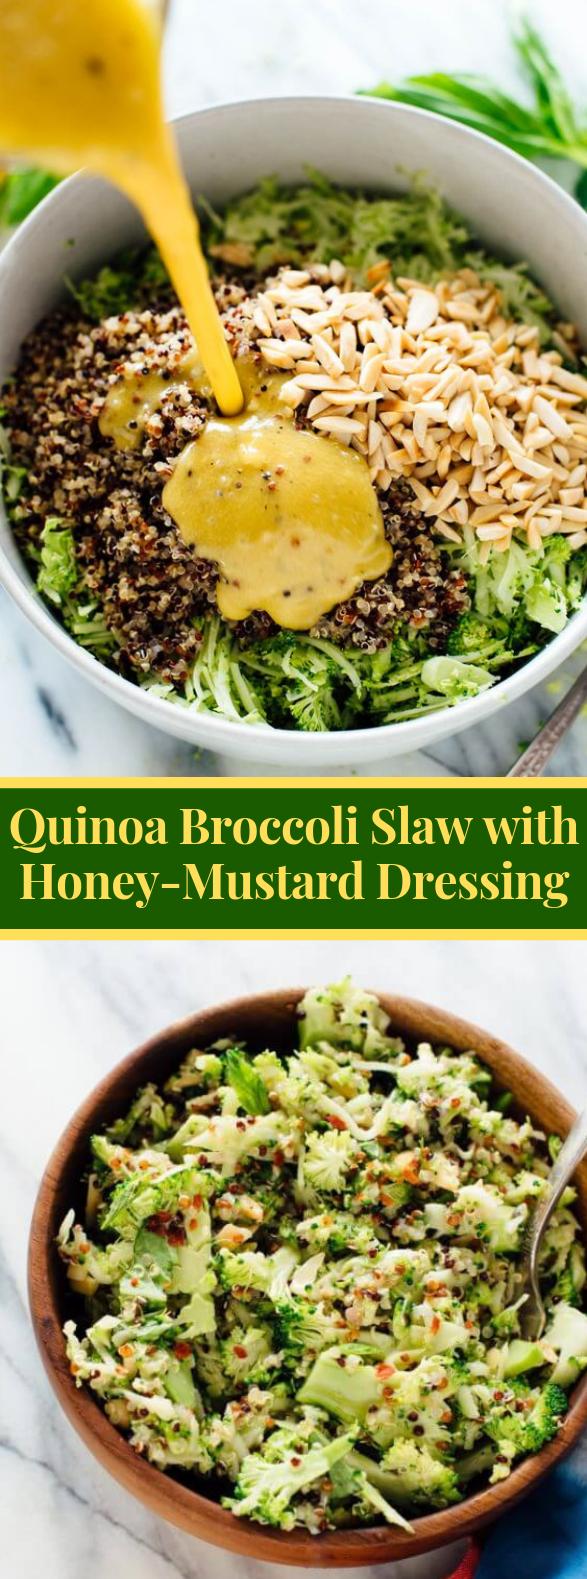 Quinoa Broccoli Slaw with Honey-Mustard Dressing #vegetarian #spring